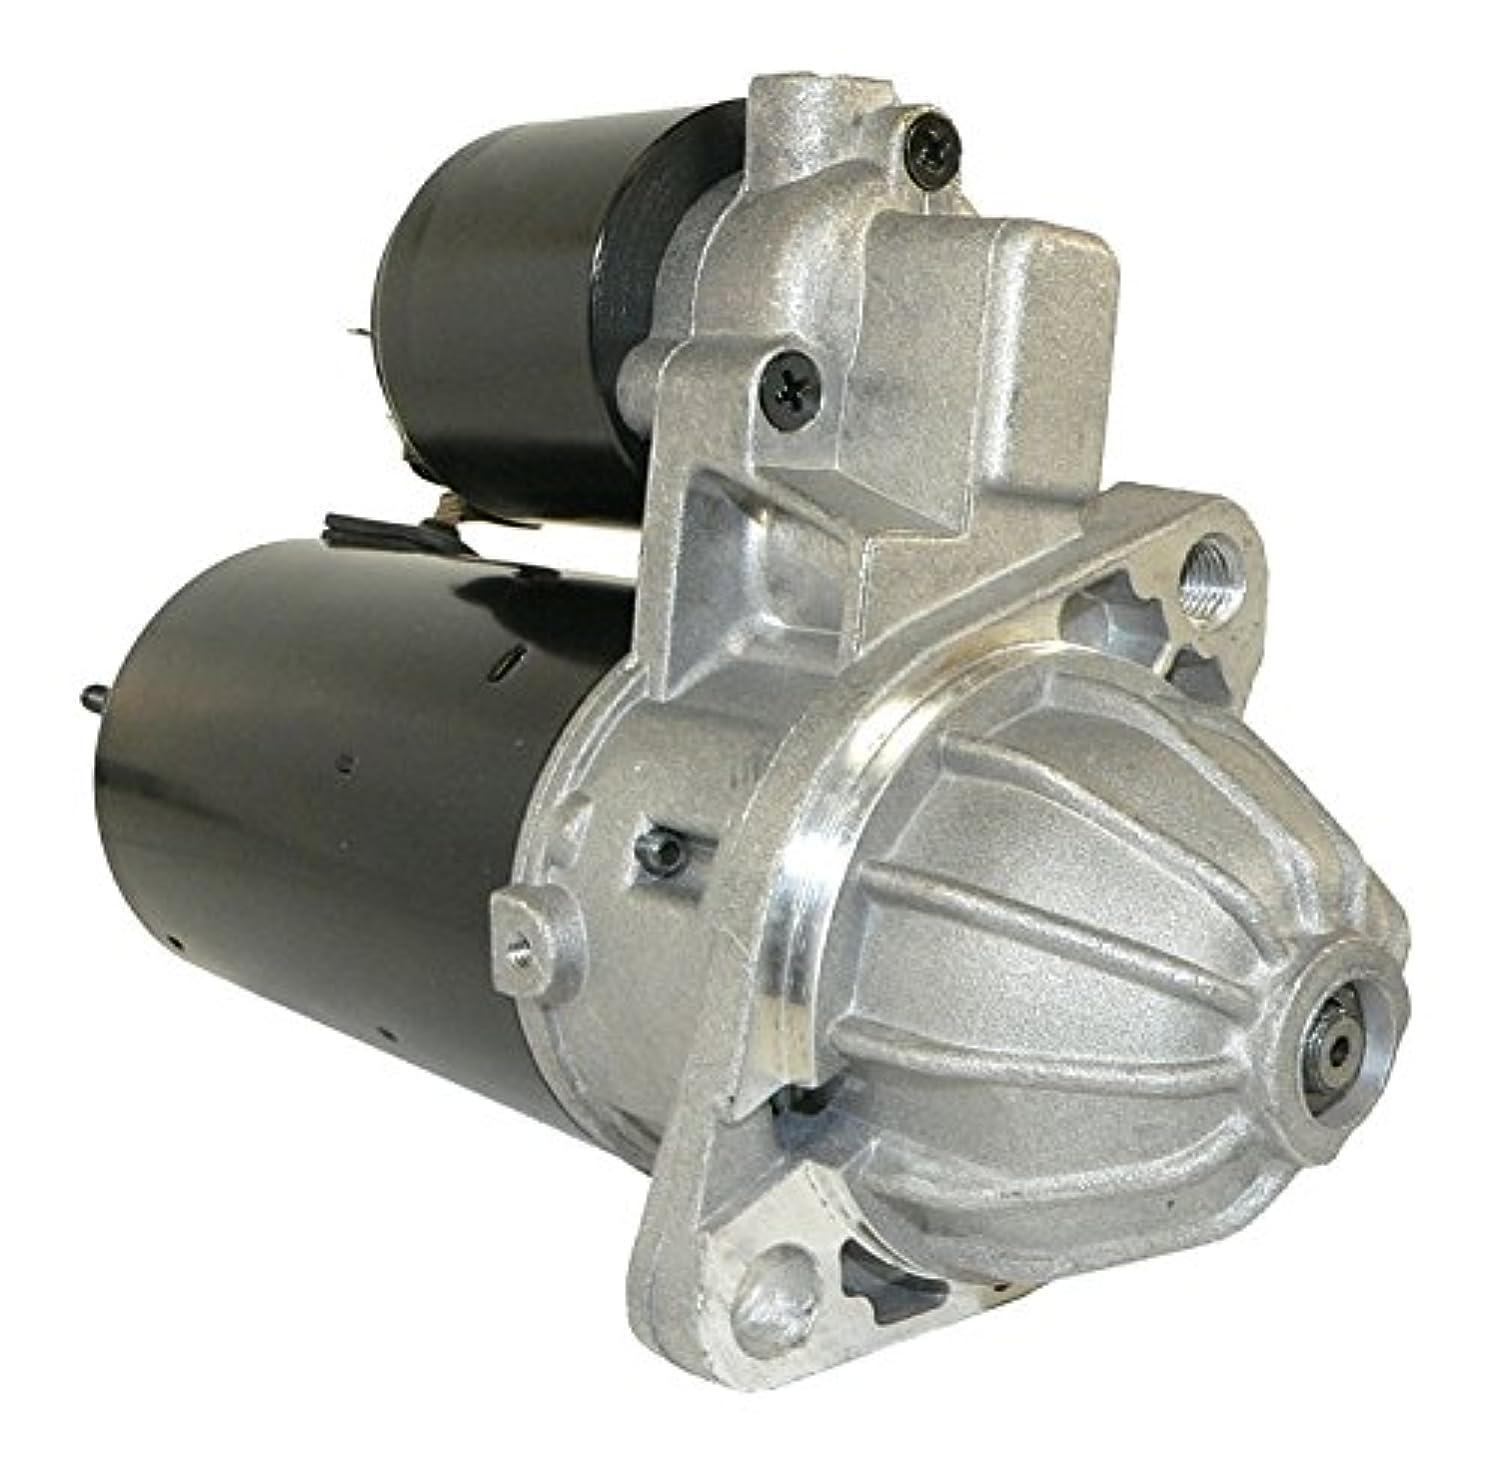 DB Electrical SBO0134 New Starter For 3.5L 3.5 Mitsubishi Diamante 97 98 99 00 01 02 03 04 1997 1998 1999 2000 2001 2002 2003 2004 AW343141 MD172864 MD373135 2-1891-BO 2-2205-BO 17731 410-24059